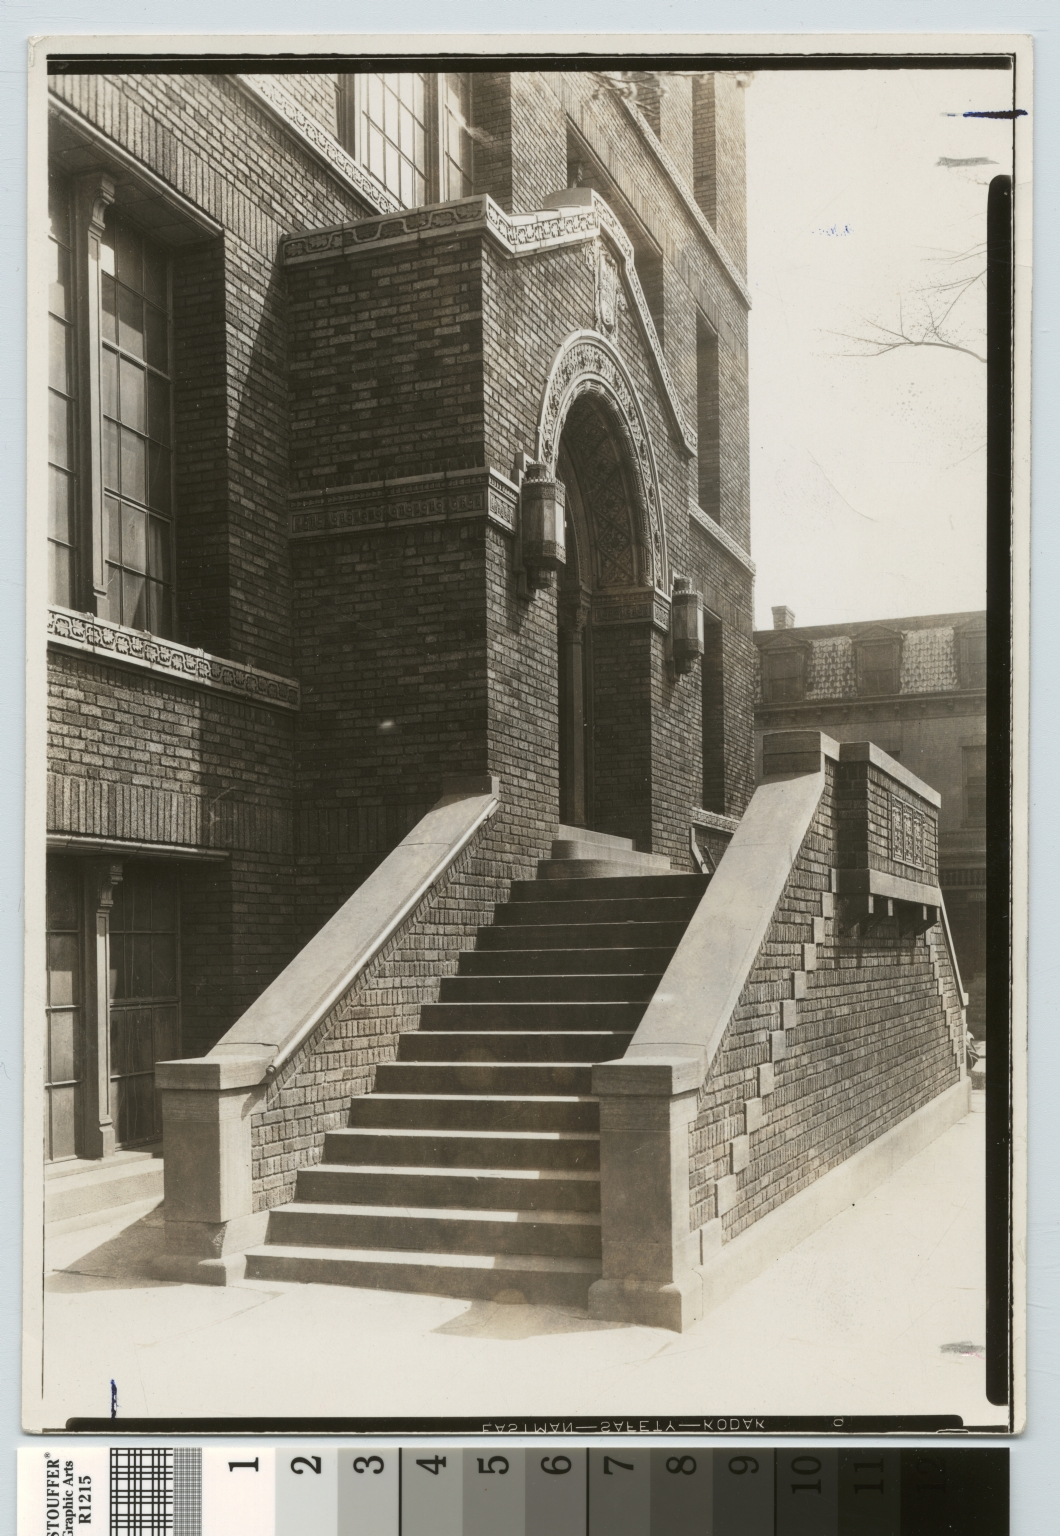 Entrance, Bevier Memorial Building, Rochester Athenaeum and Mechanics Institute